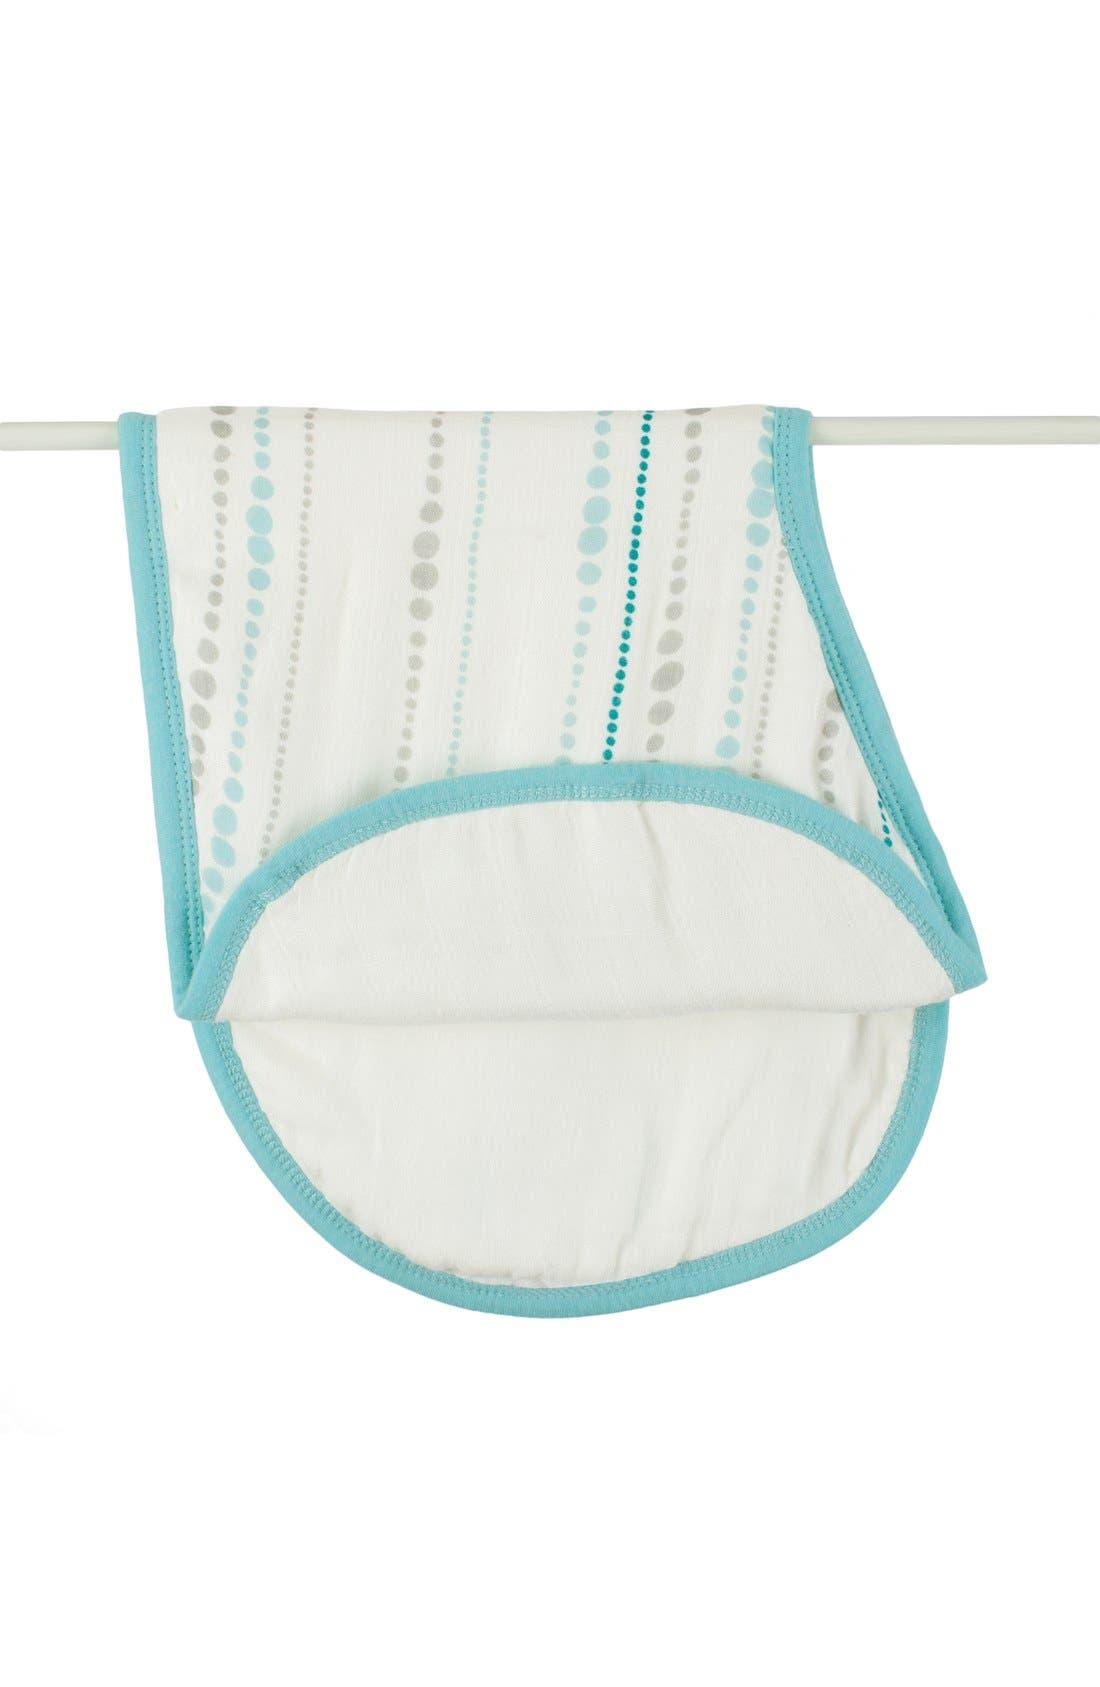 Alternate Image 1 Selected - aden + anais Burpy Bib® Burp Cloth & Bib